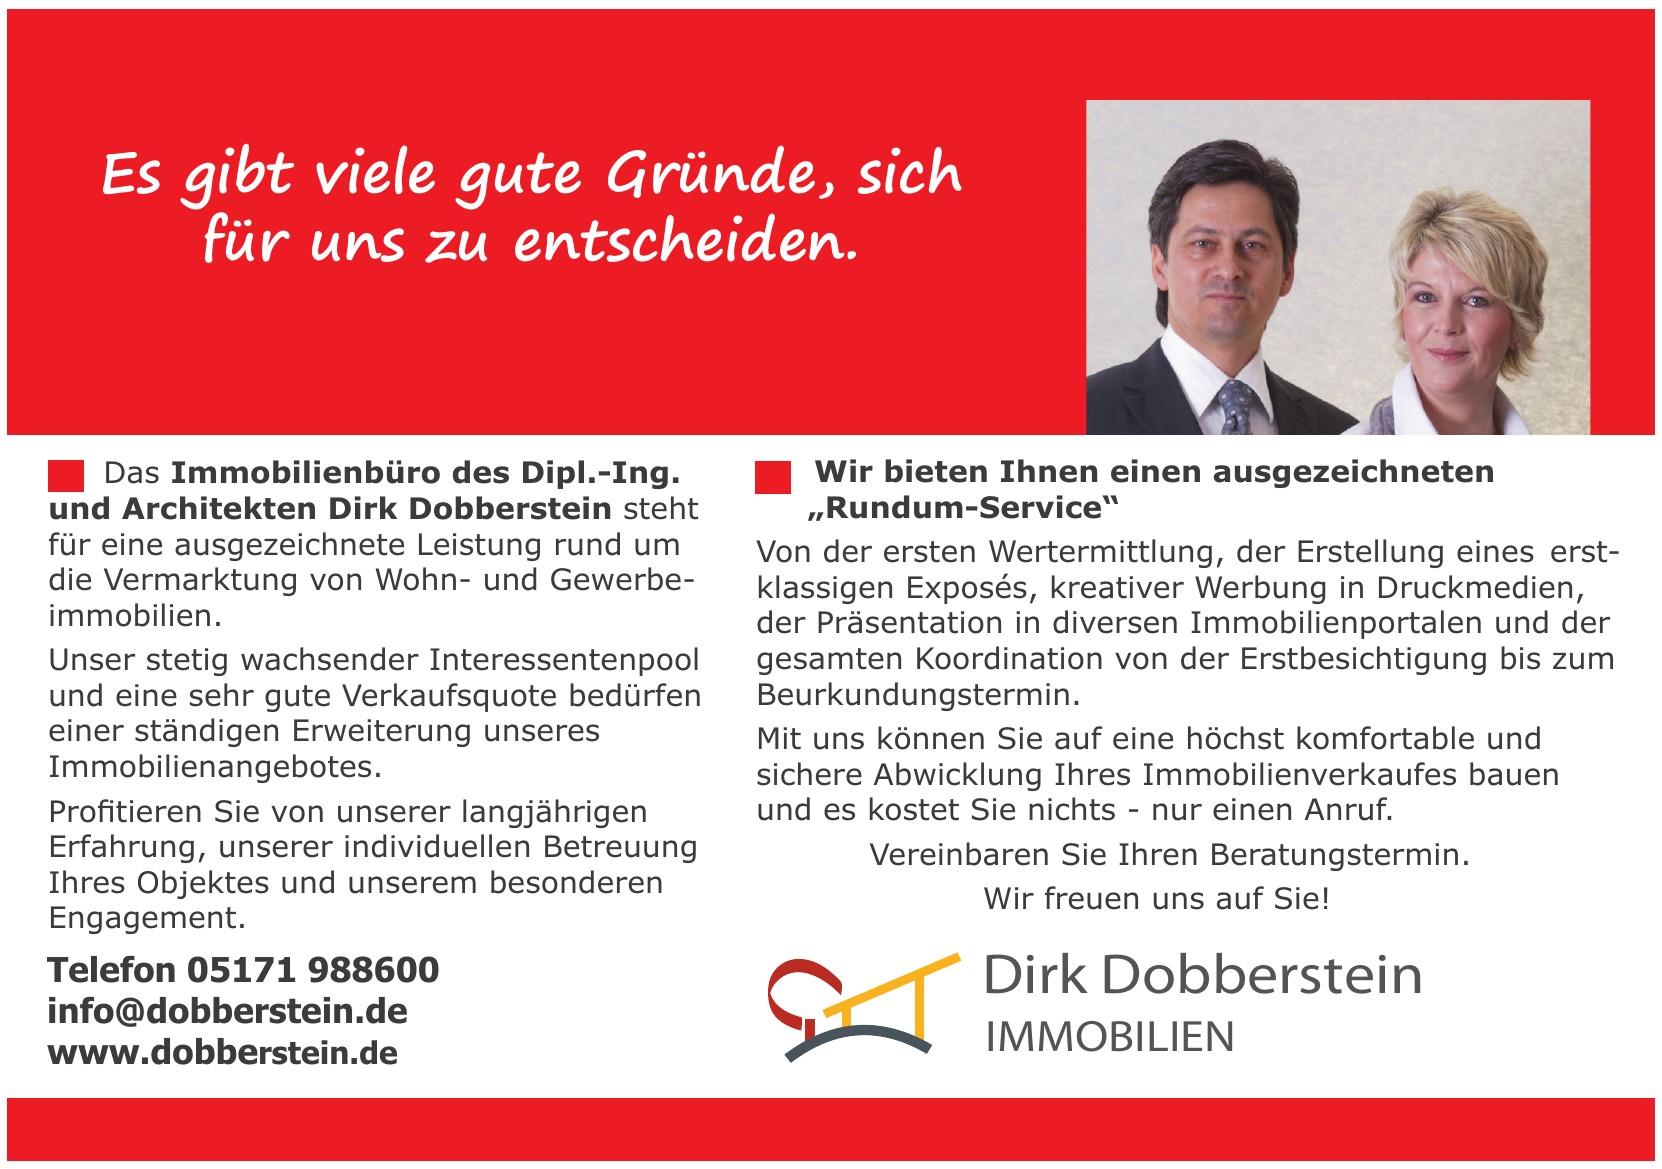 Dirk Dobberstein  IMMOBILIEN